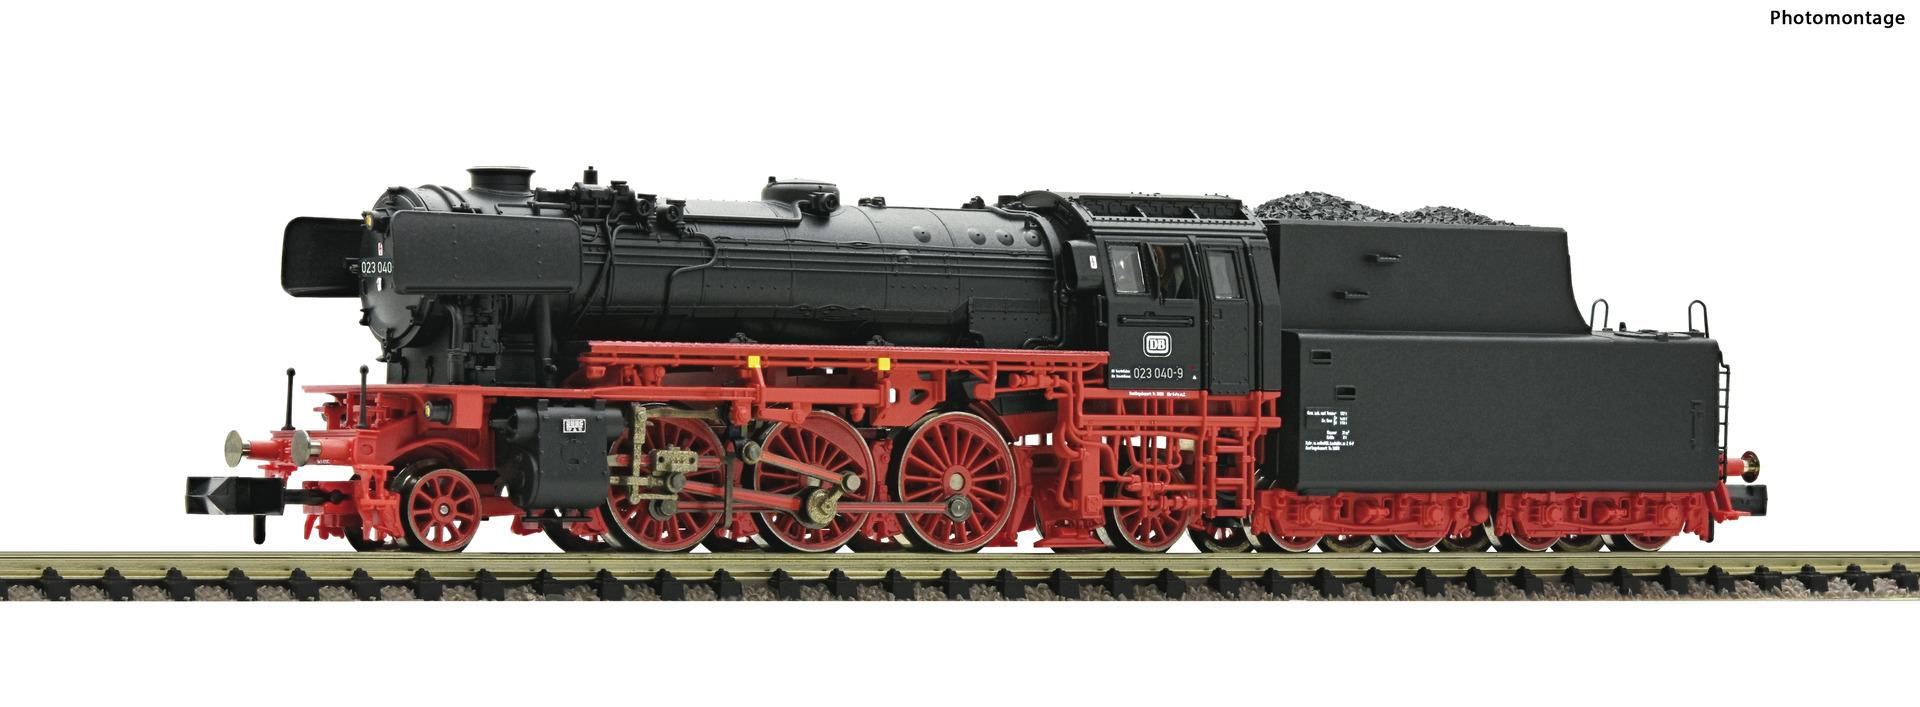 712306